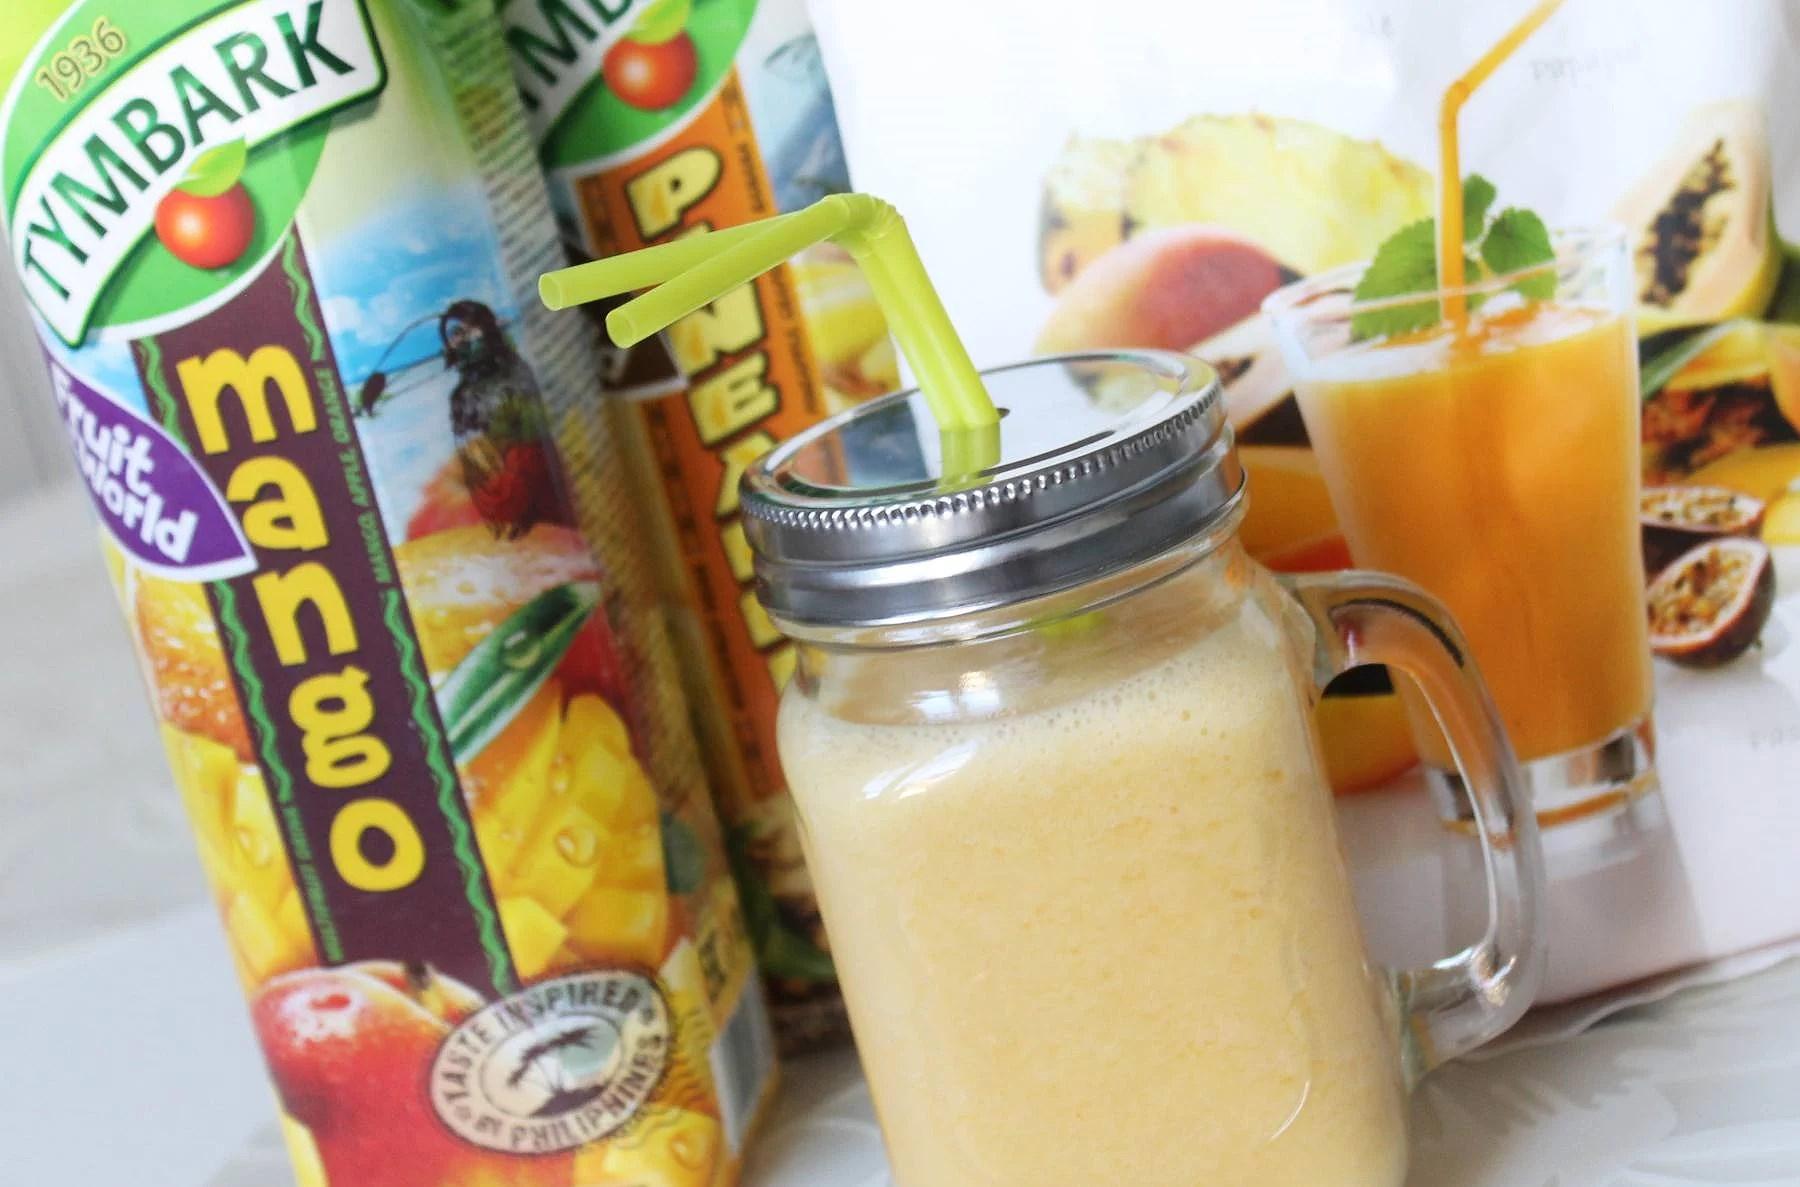 Mango/Pineapple smoothie